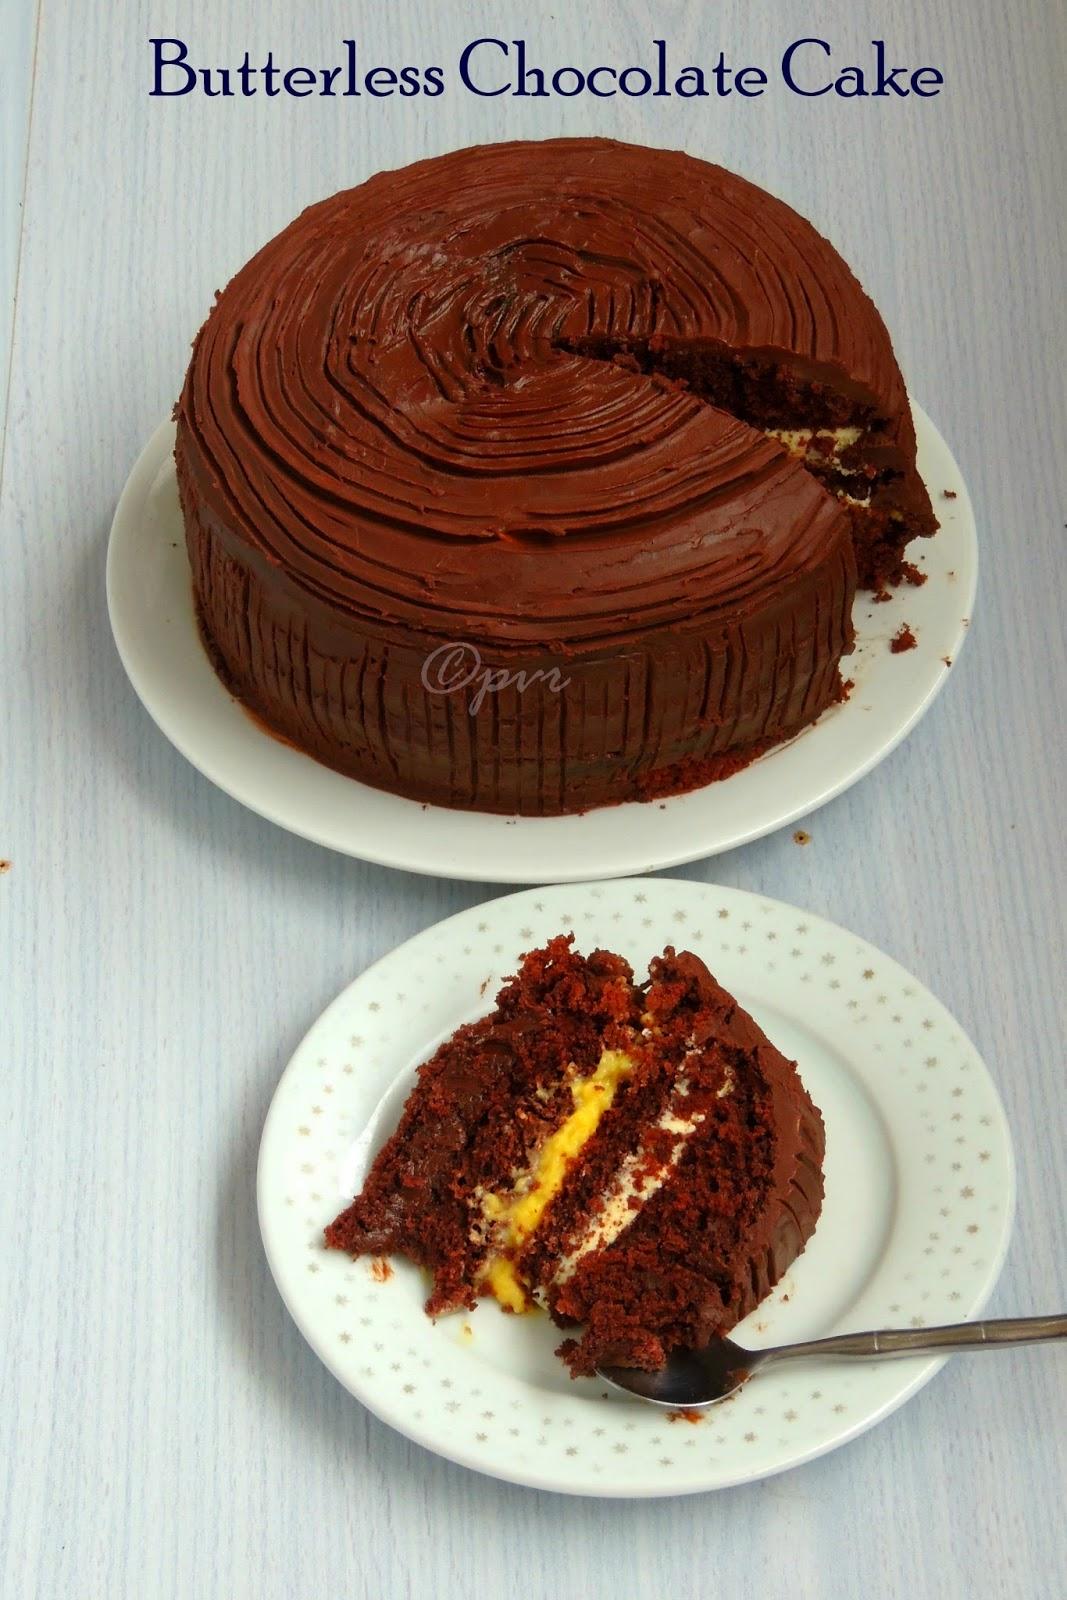 Chocolate Cake with Eggless Orange Custard Cream, Eggless White Chocolate Mousse and Chocolate Ganache, Butterless chocolate cake